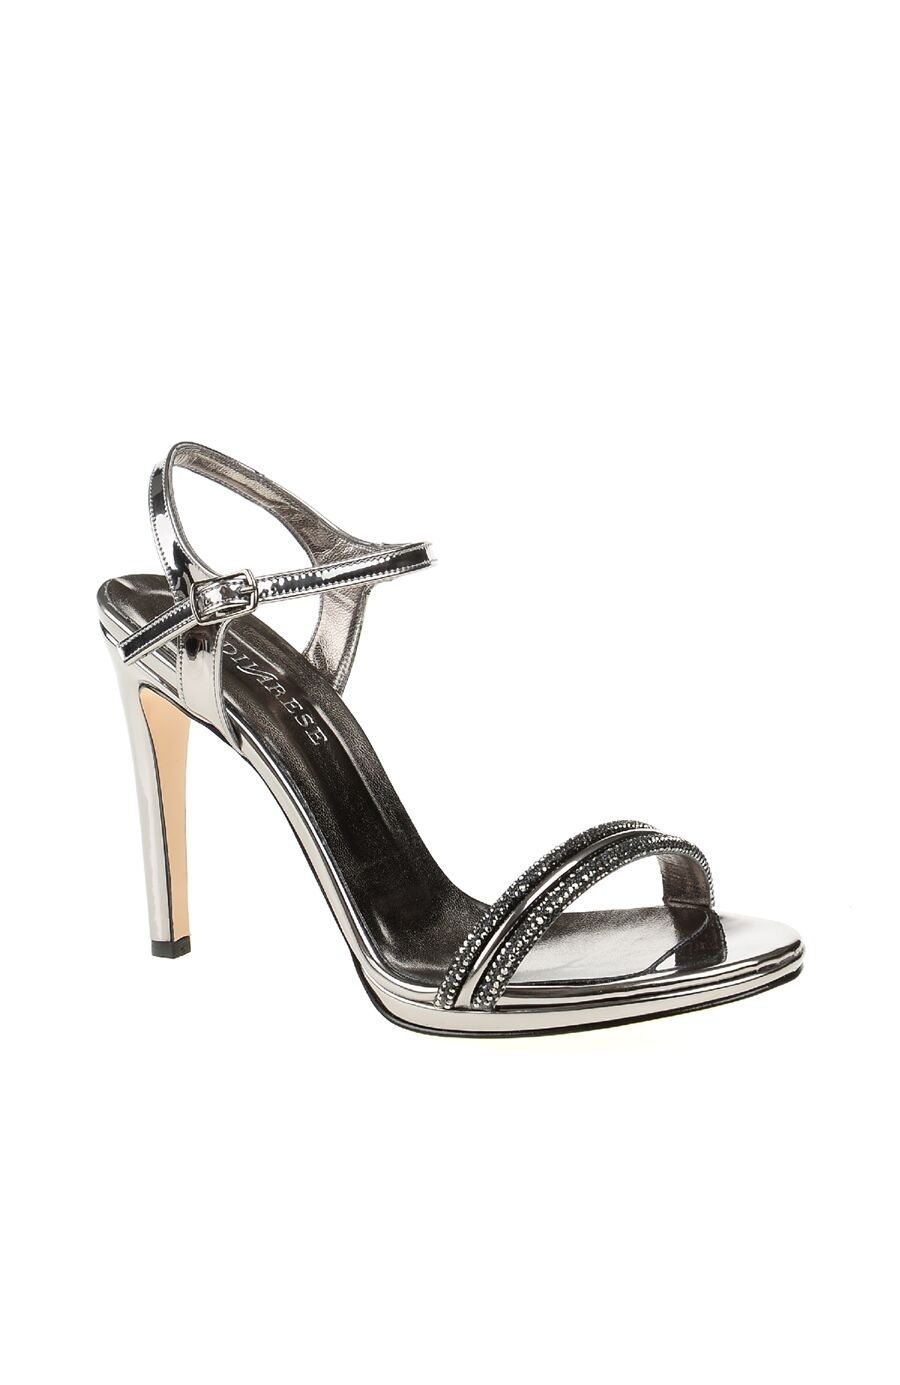 Dıvarese Select Taşlı Sandalet – 185.0 TL